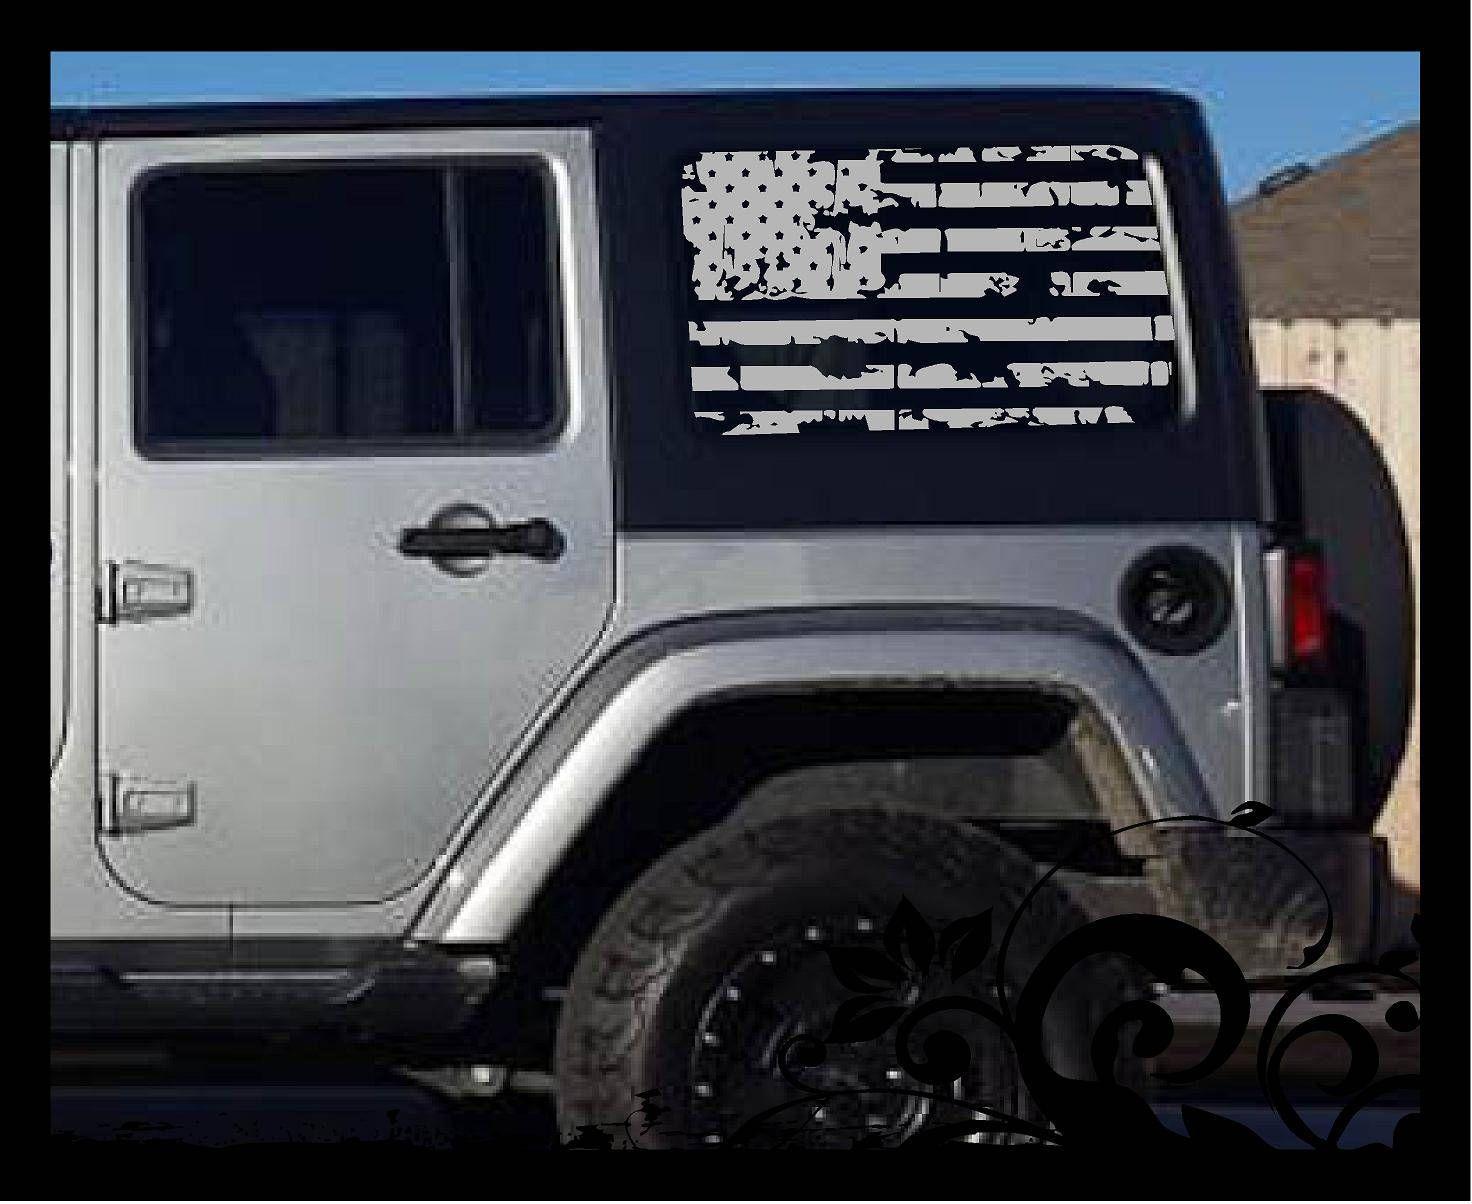 Flag Decal Jeep Wrangler Side Window American Distressed Etsy Jeep Wrangler Jeep Jeep Wrangler Accessories